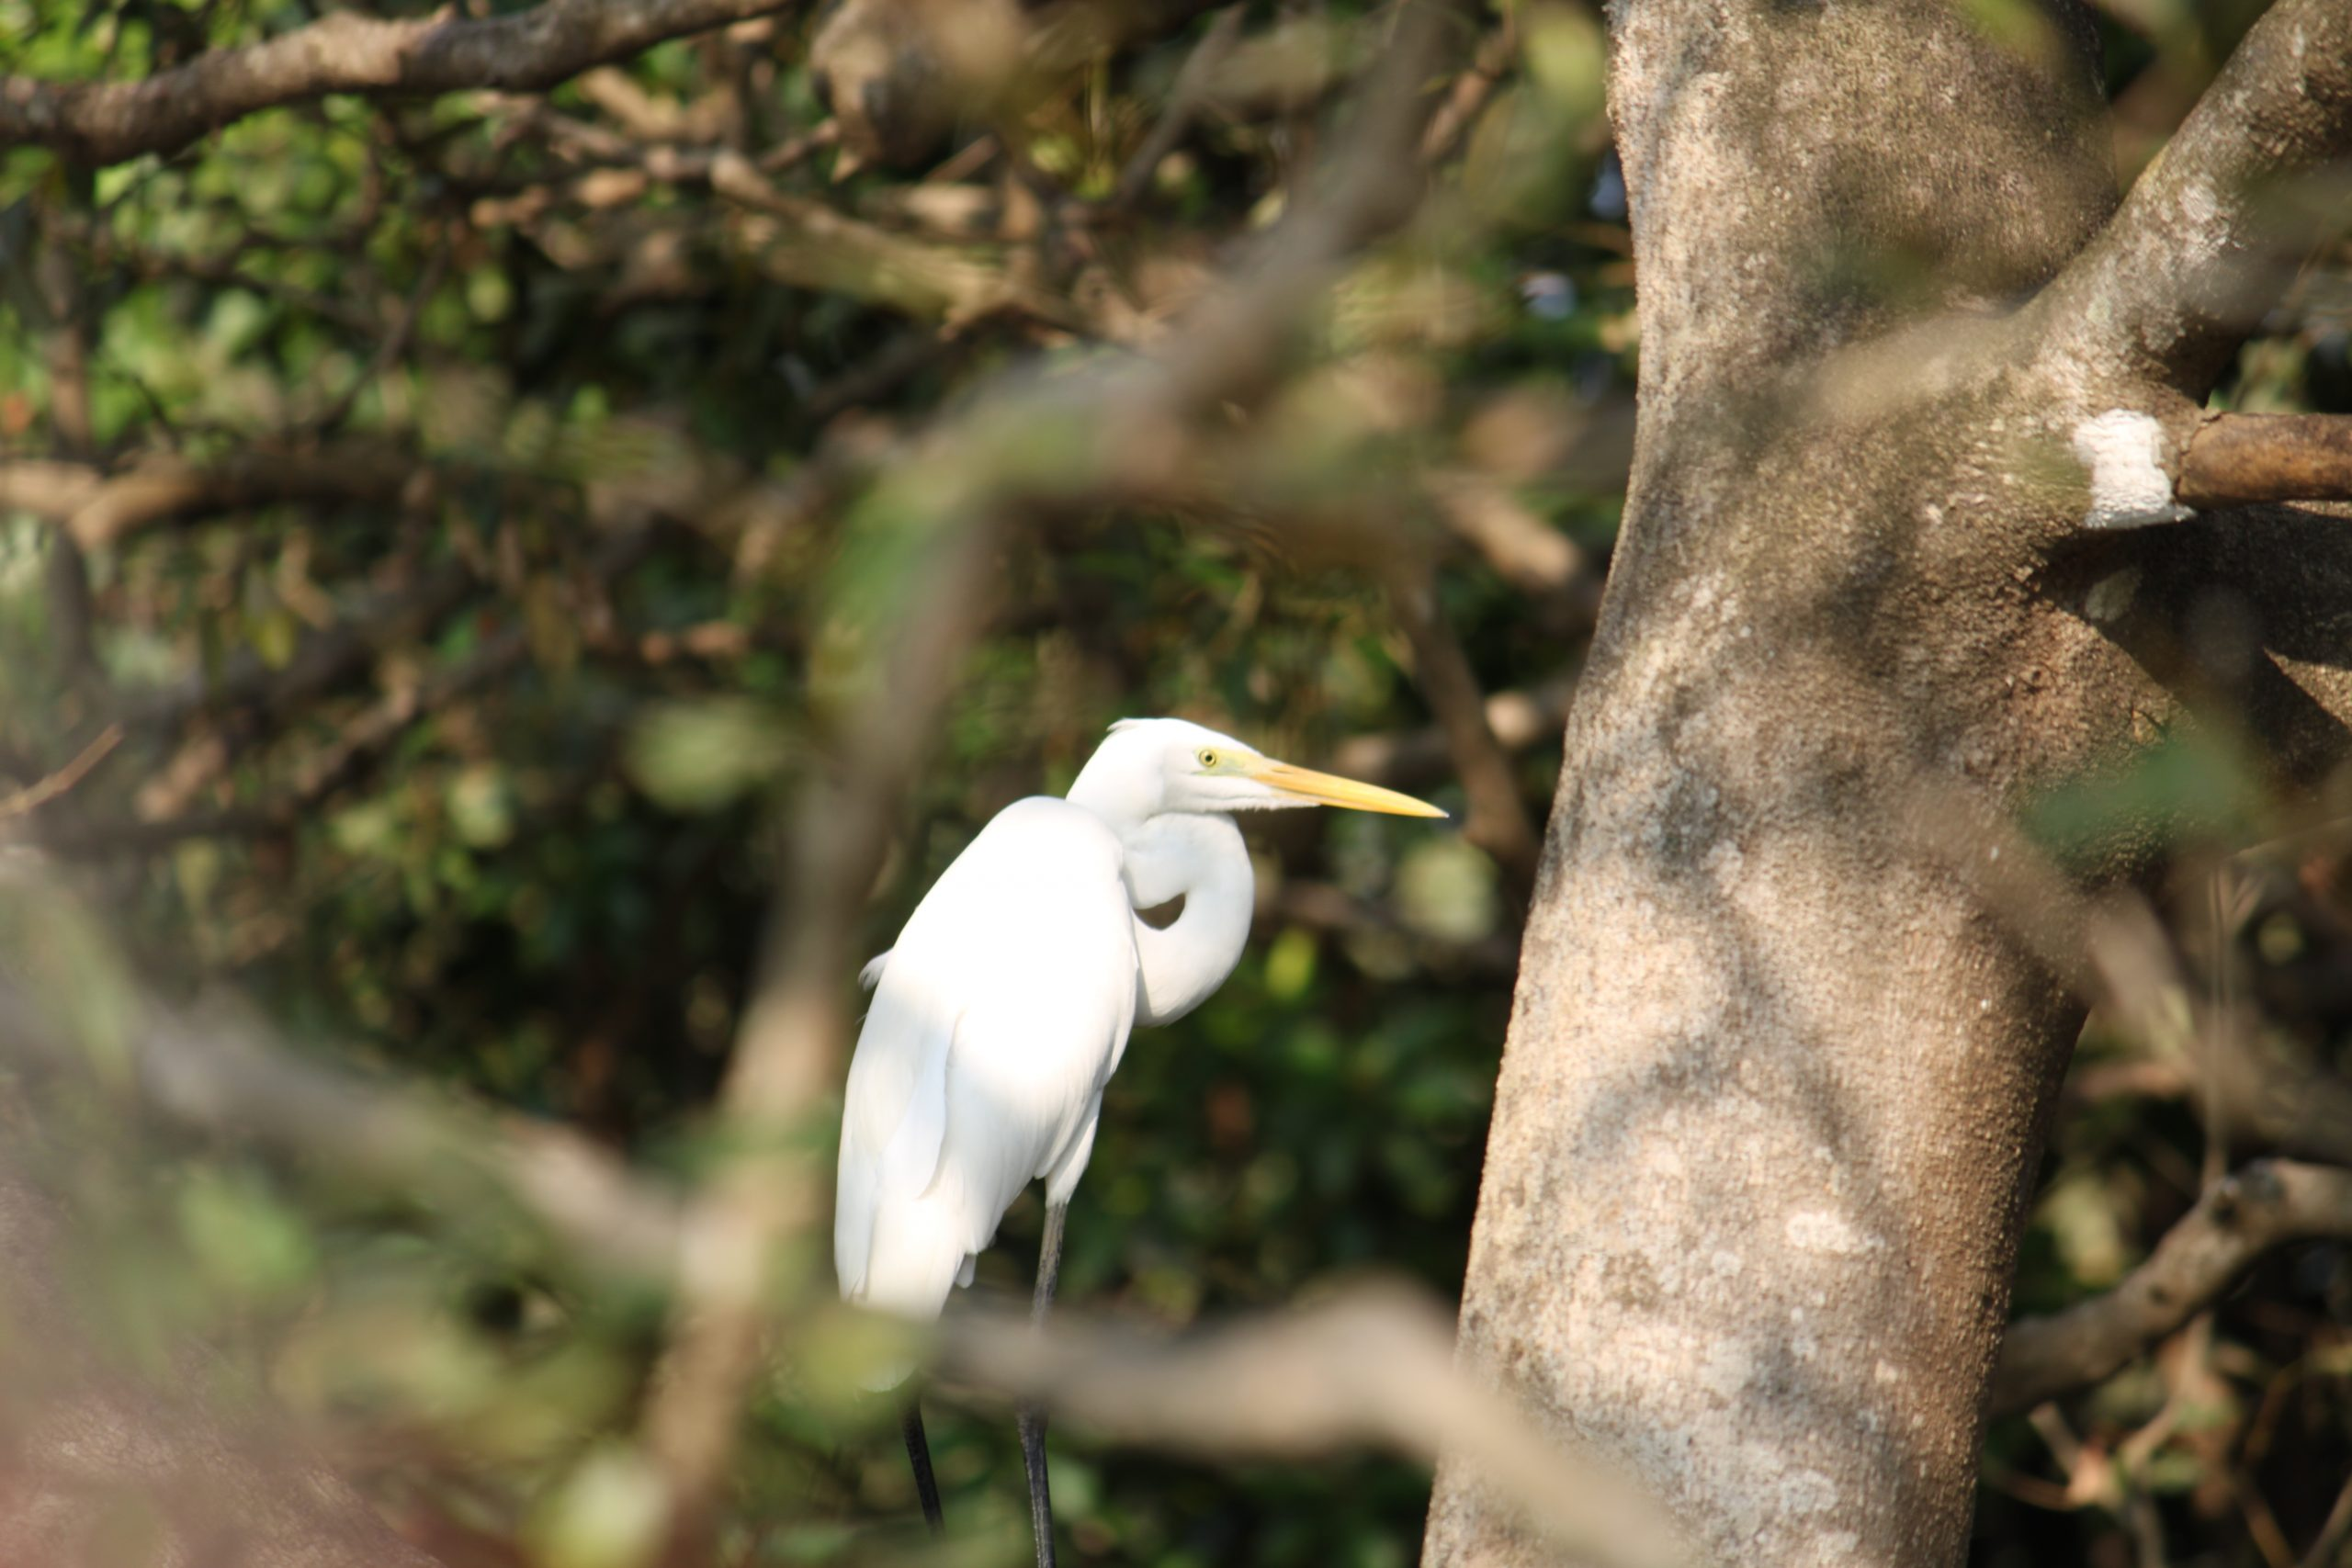 Crane on tree